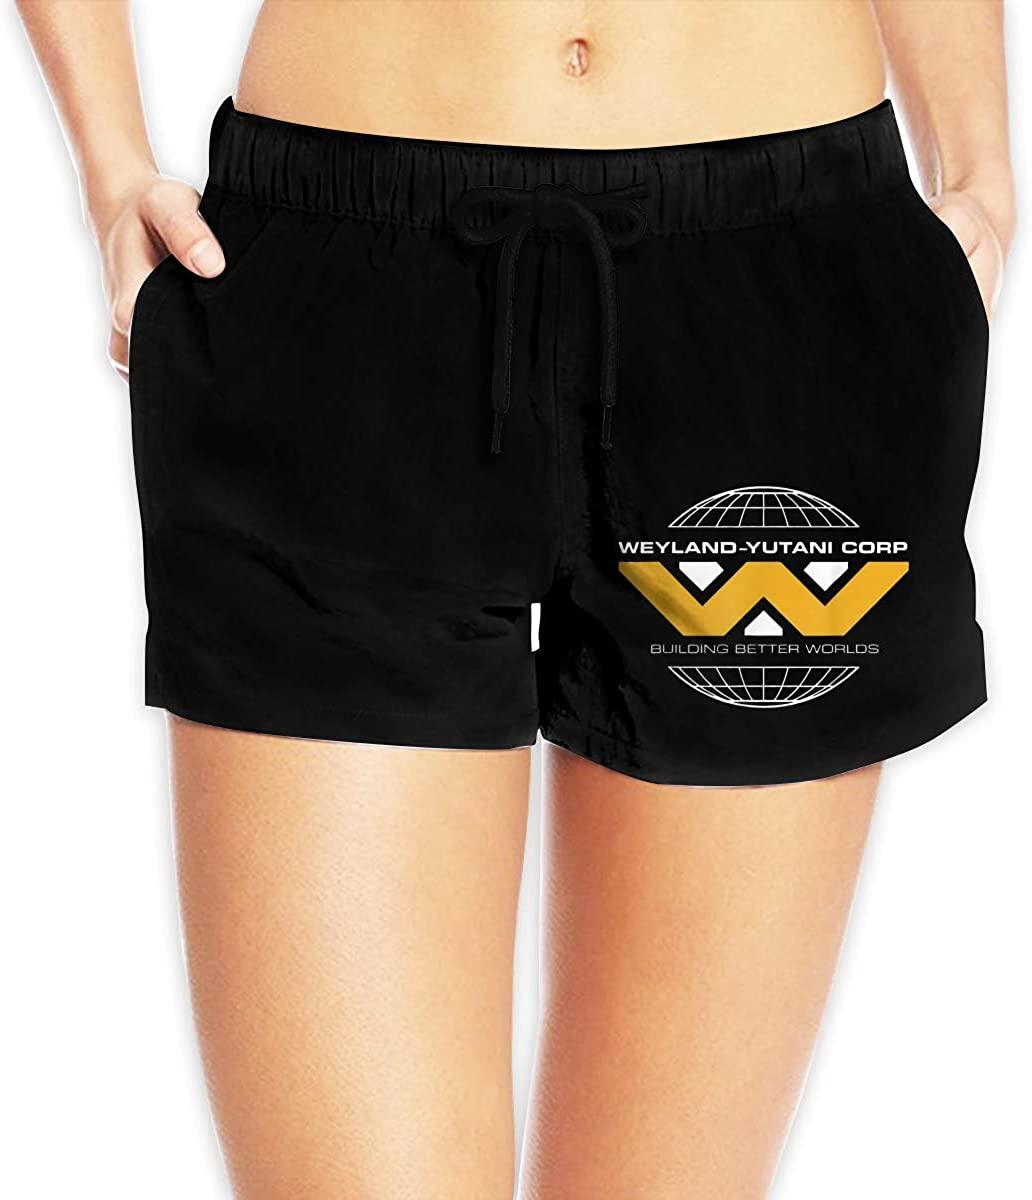 Women Sexy Hot Pants Summer Casual Shorts Weyland-Yutani Short Beach Trousers